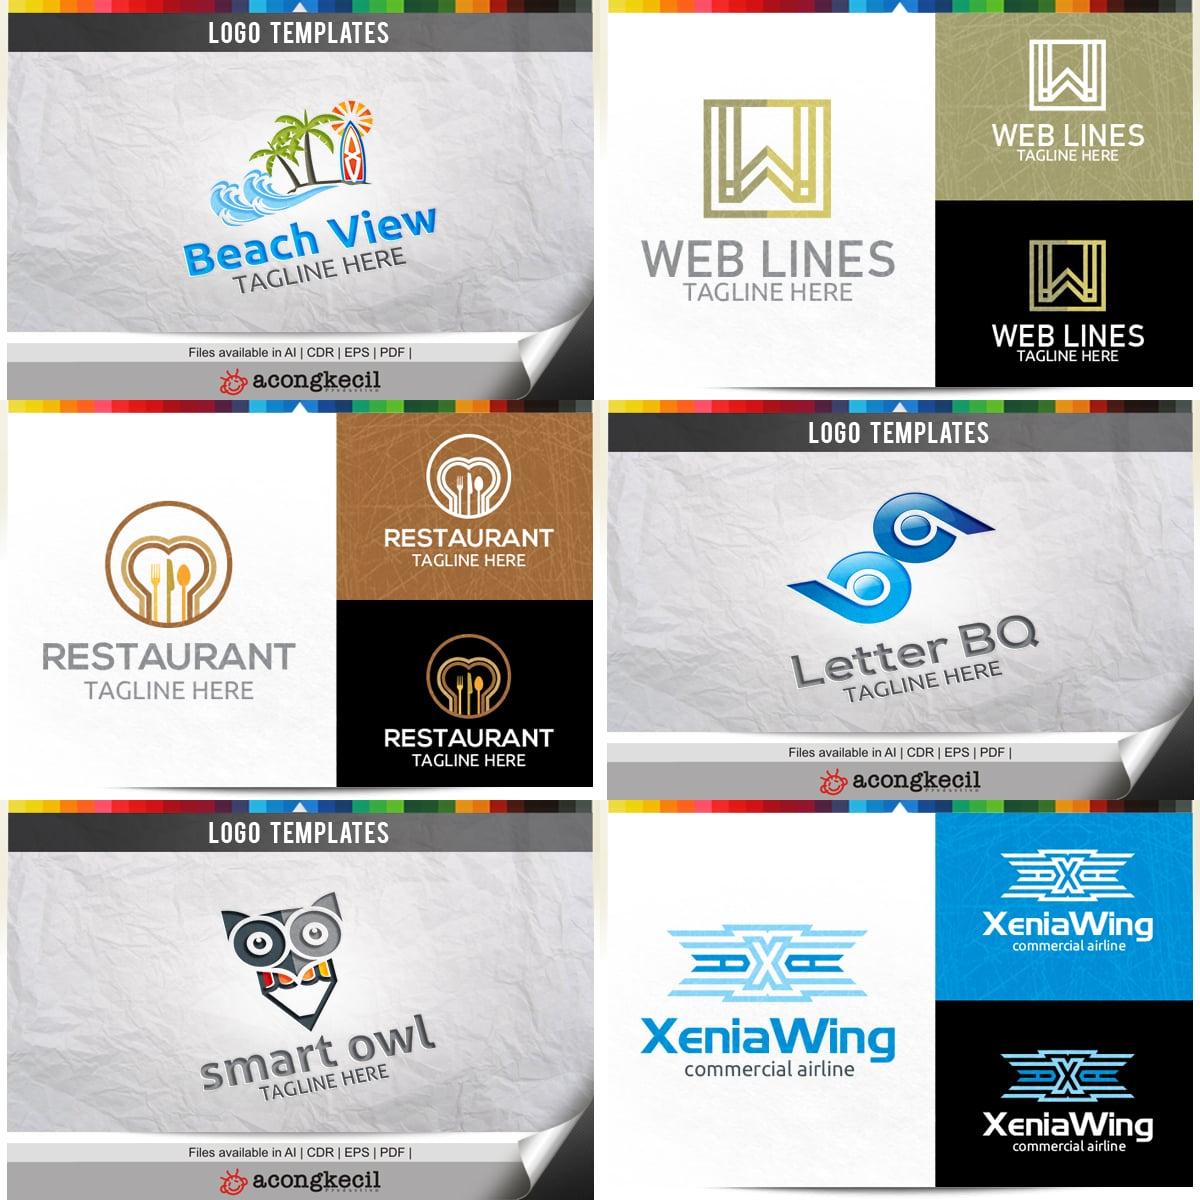 446 Business Logo Bundle - 99%+ OFF - Image Preview 25